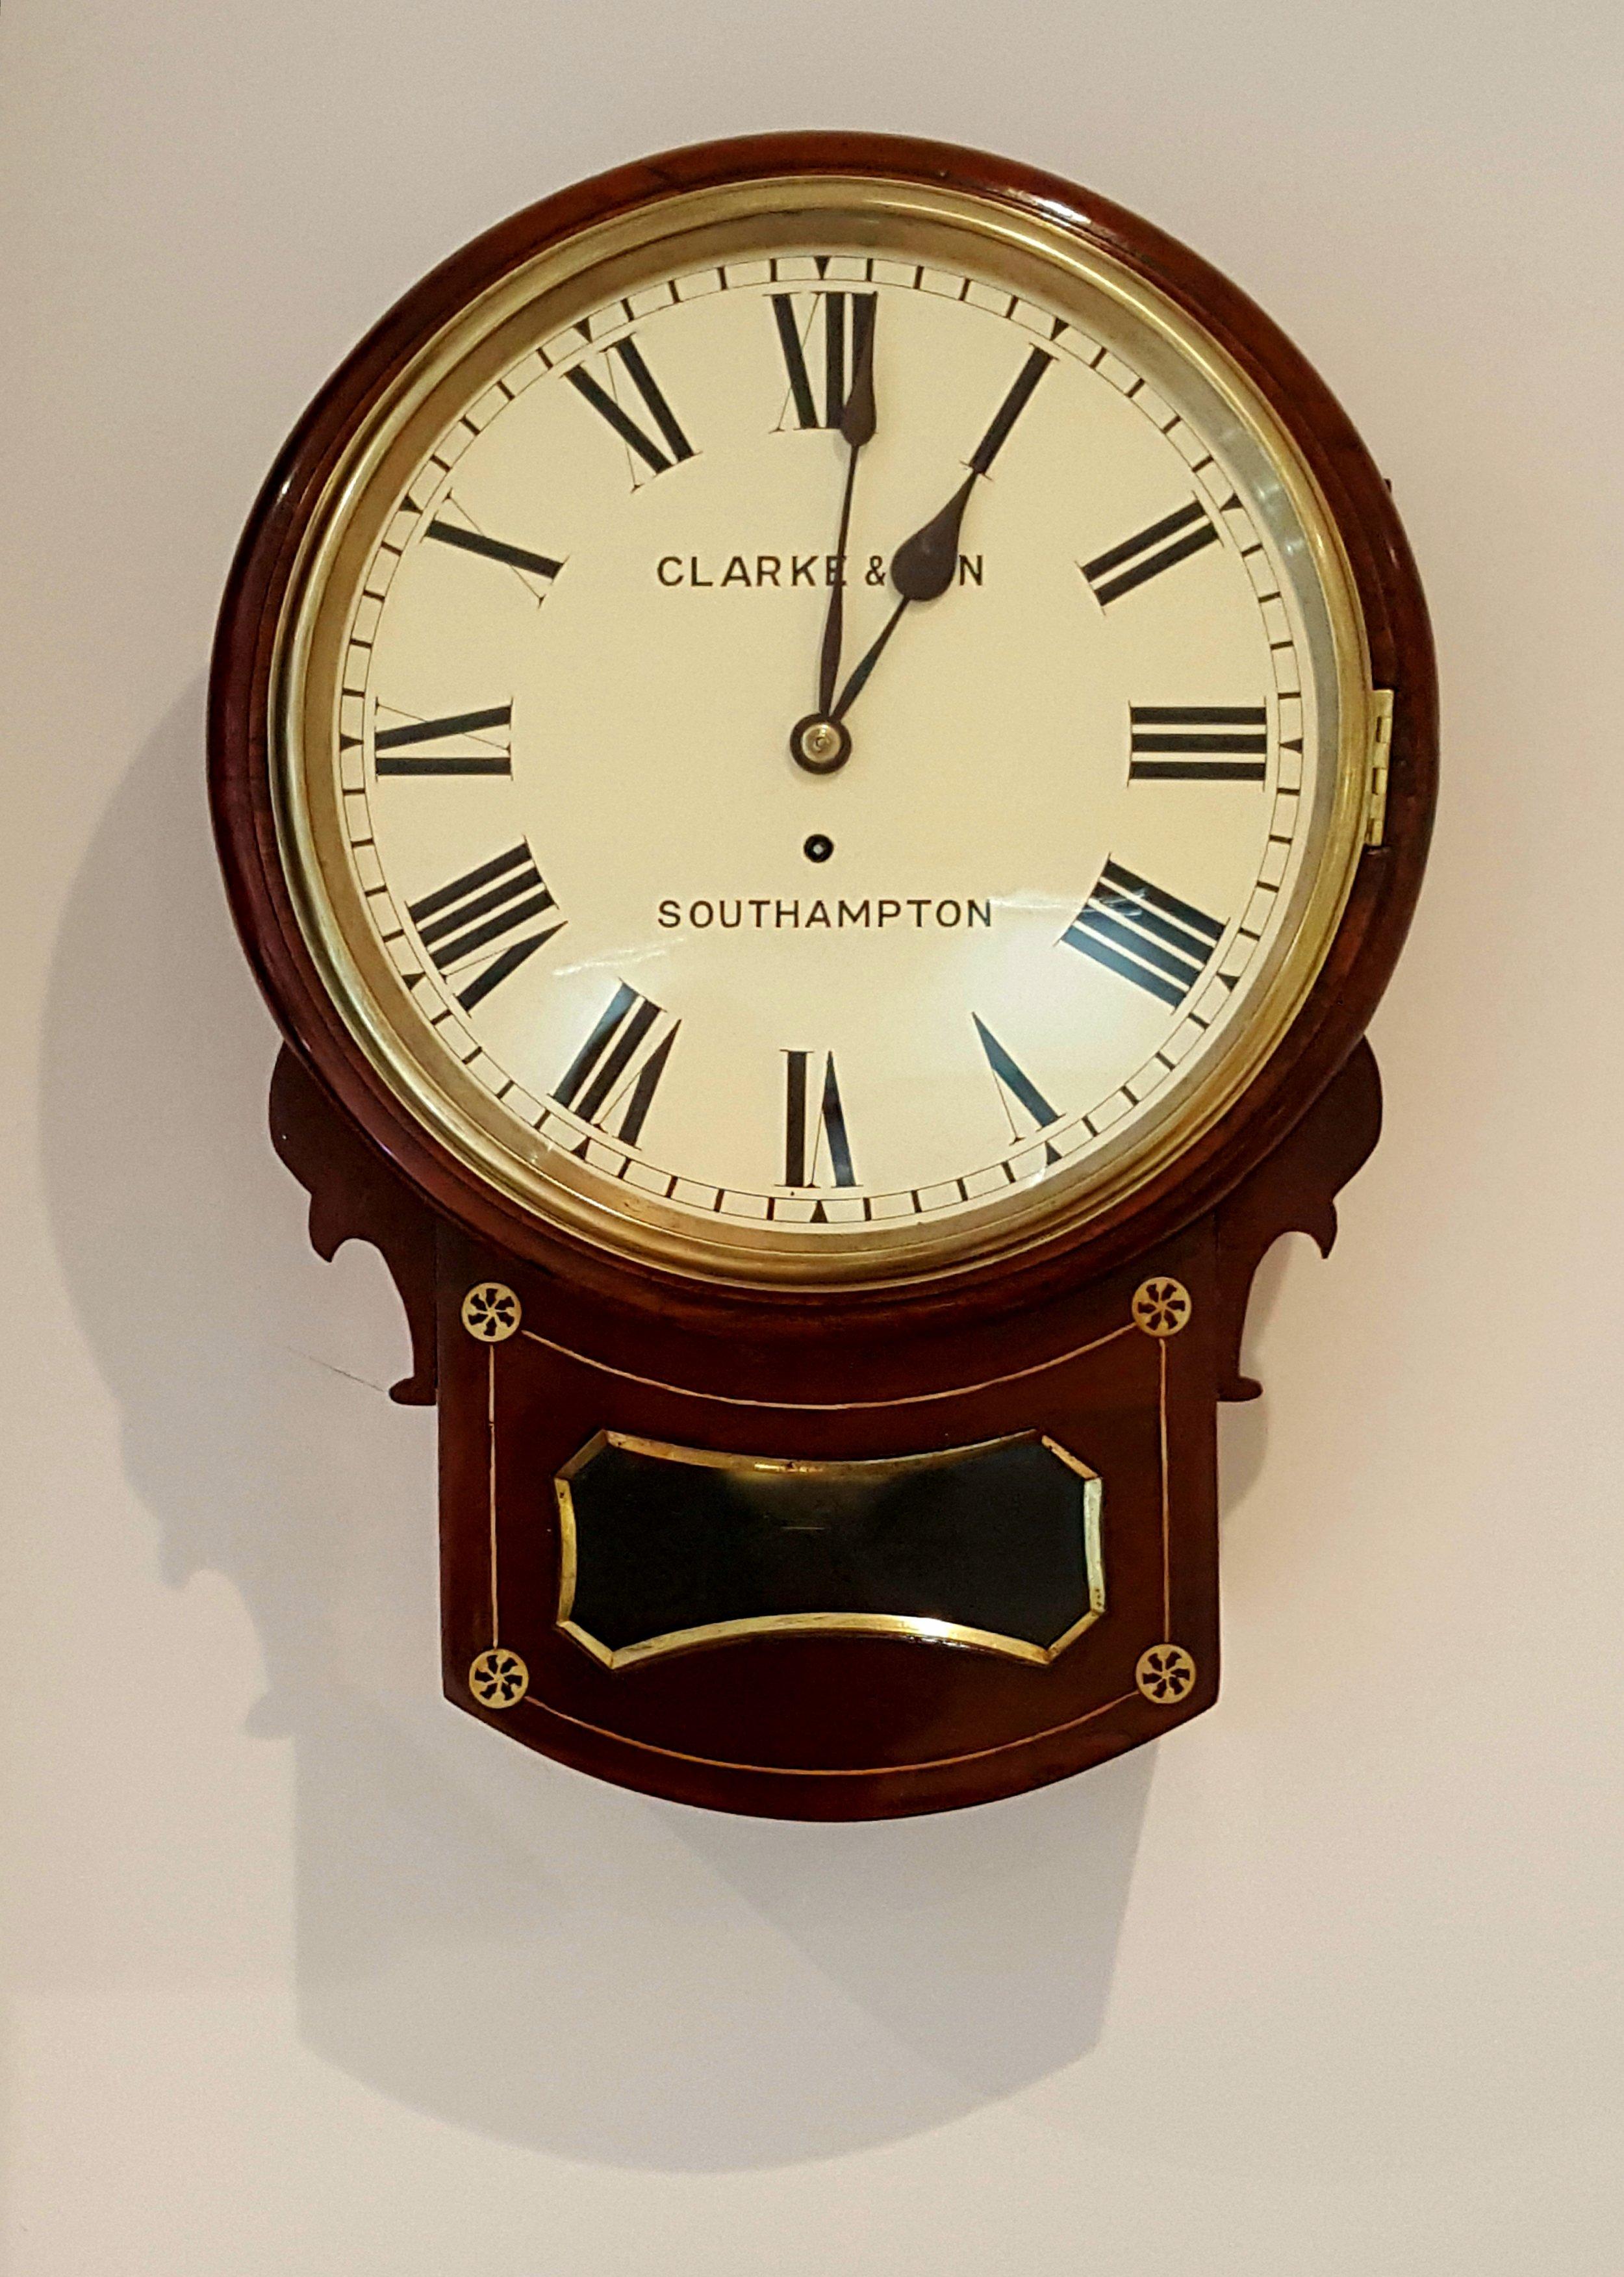 Clarke & Son English Wall Clock